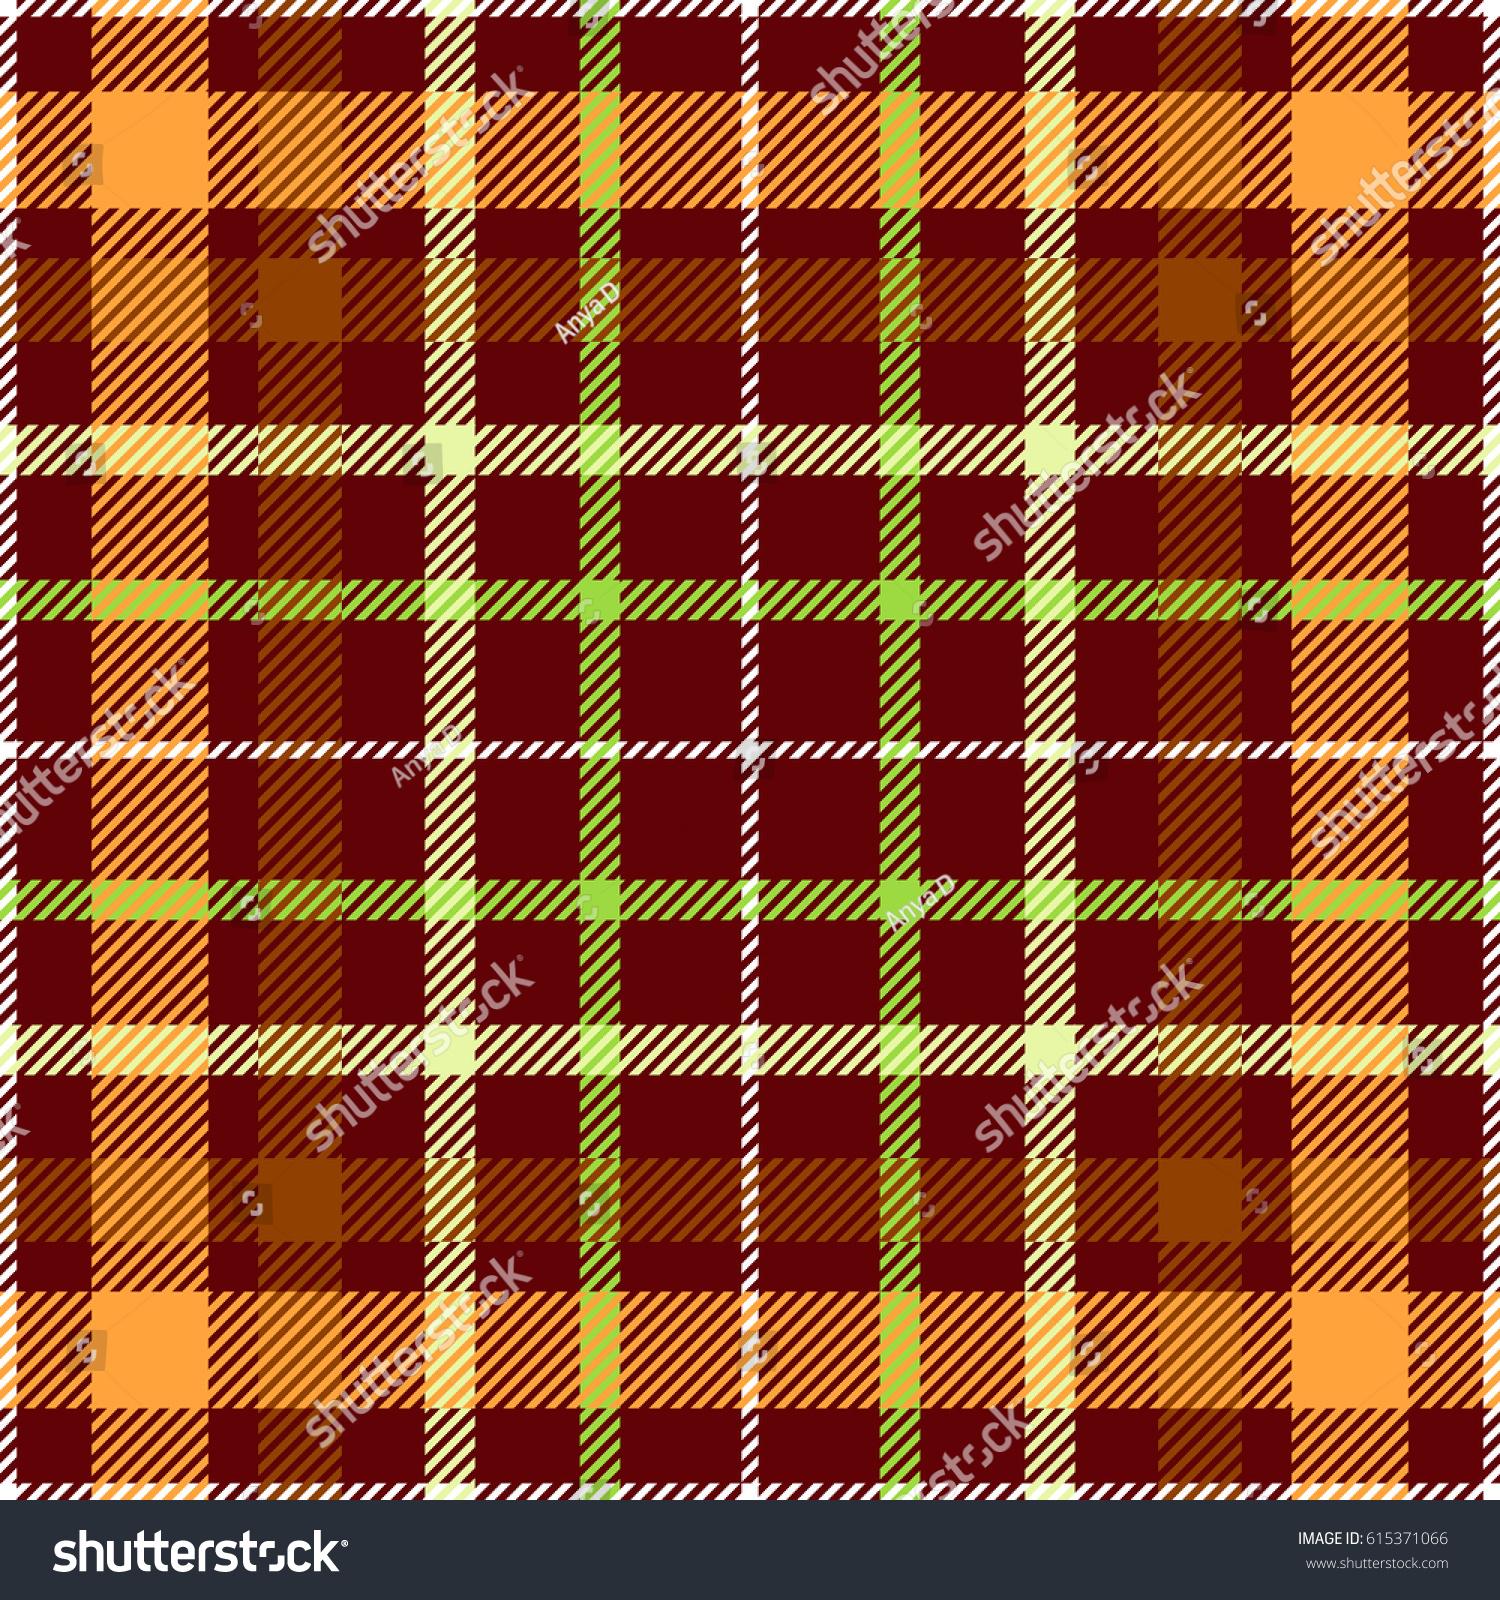 Seamless Tartan Plaid Patterncheckered Fabric Texture Stock Vector ...